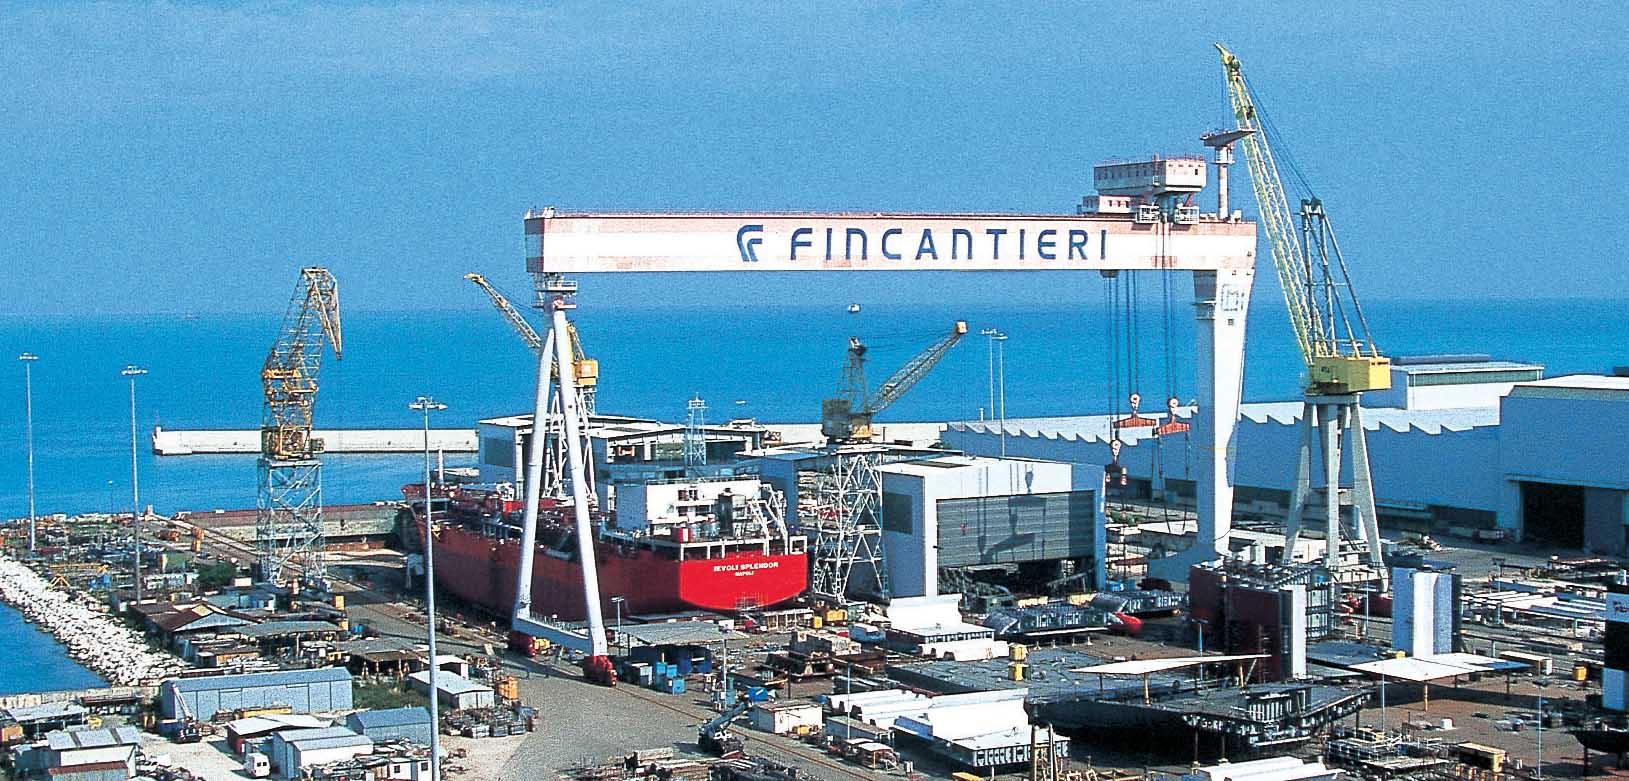 fincantieri costruzione navale 5